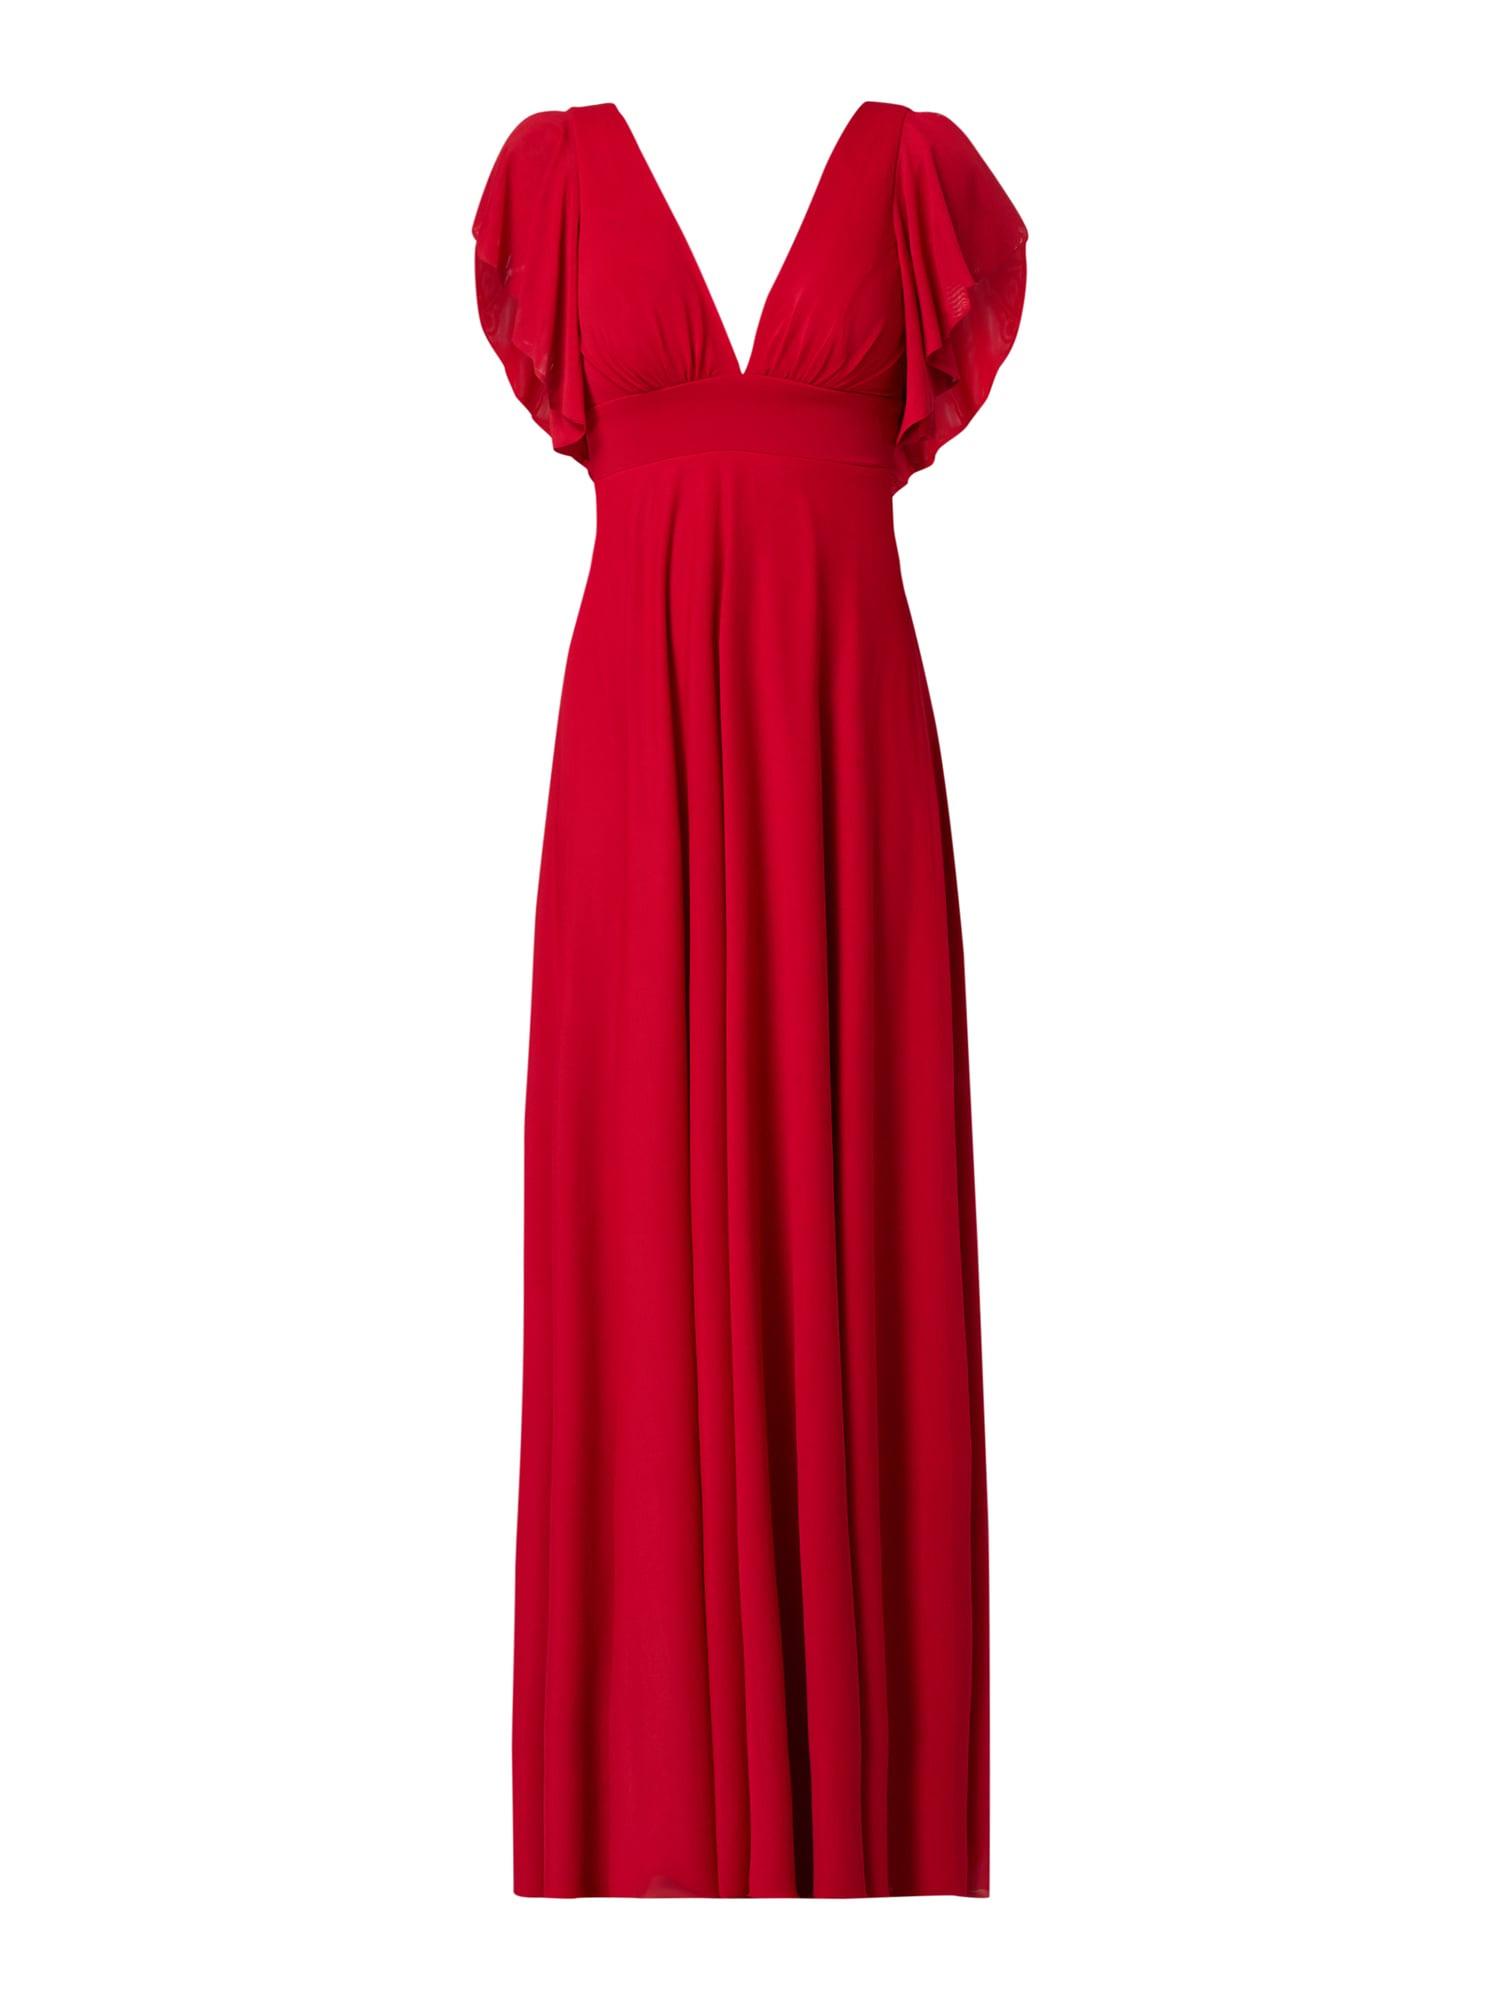 Cool P&C Abendkleider Sale SpezialgebietDesigner Genial P&C Abendkleider Sale Design